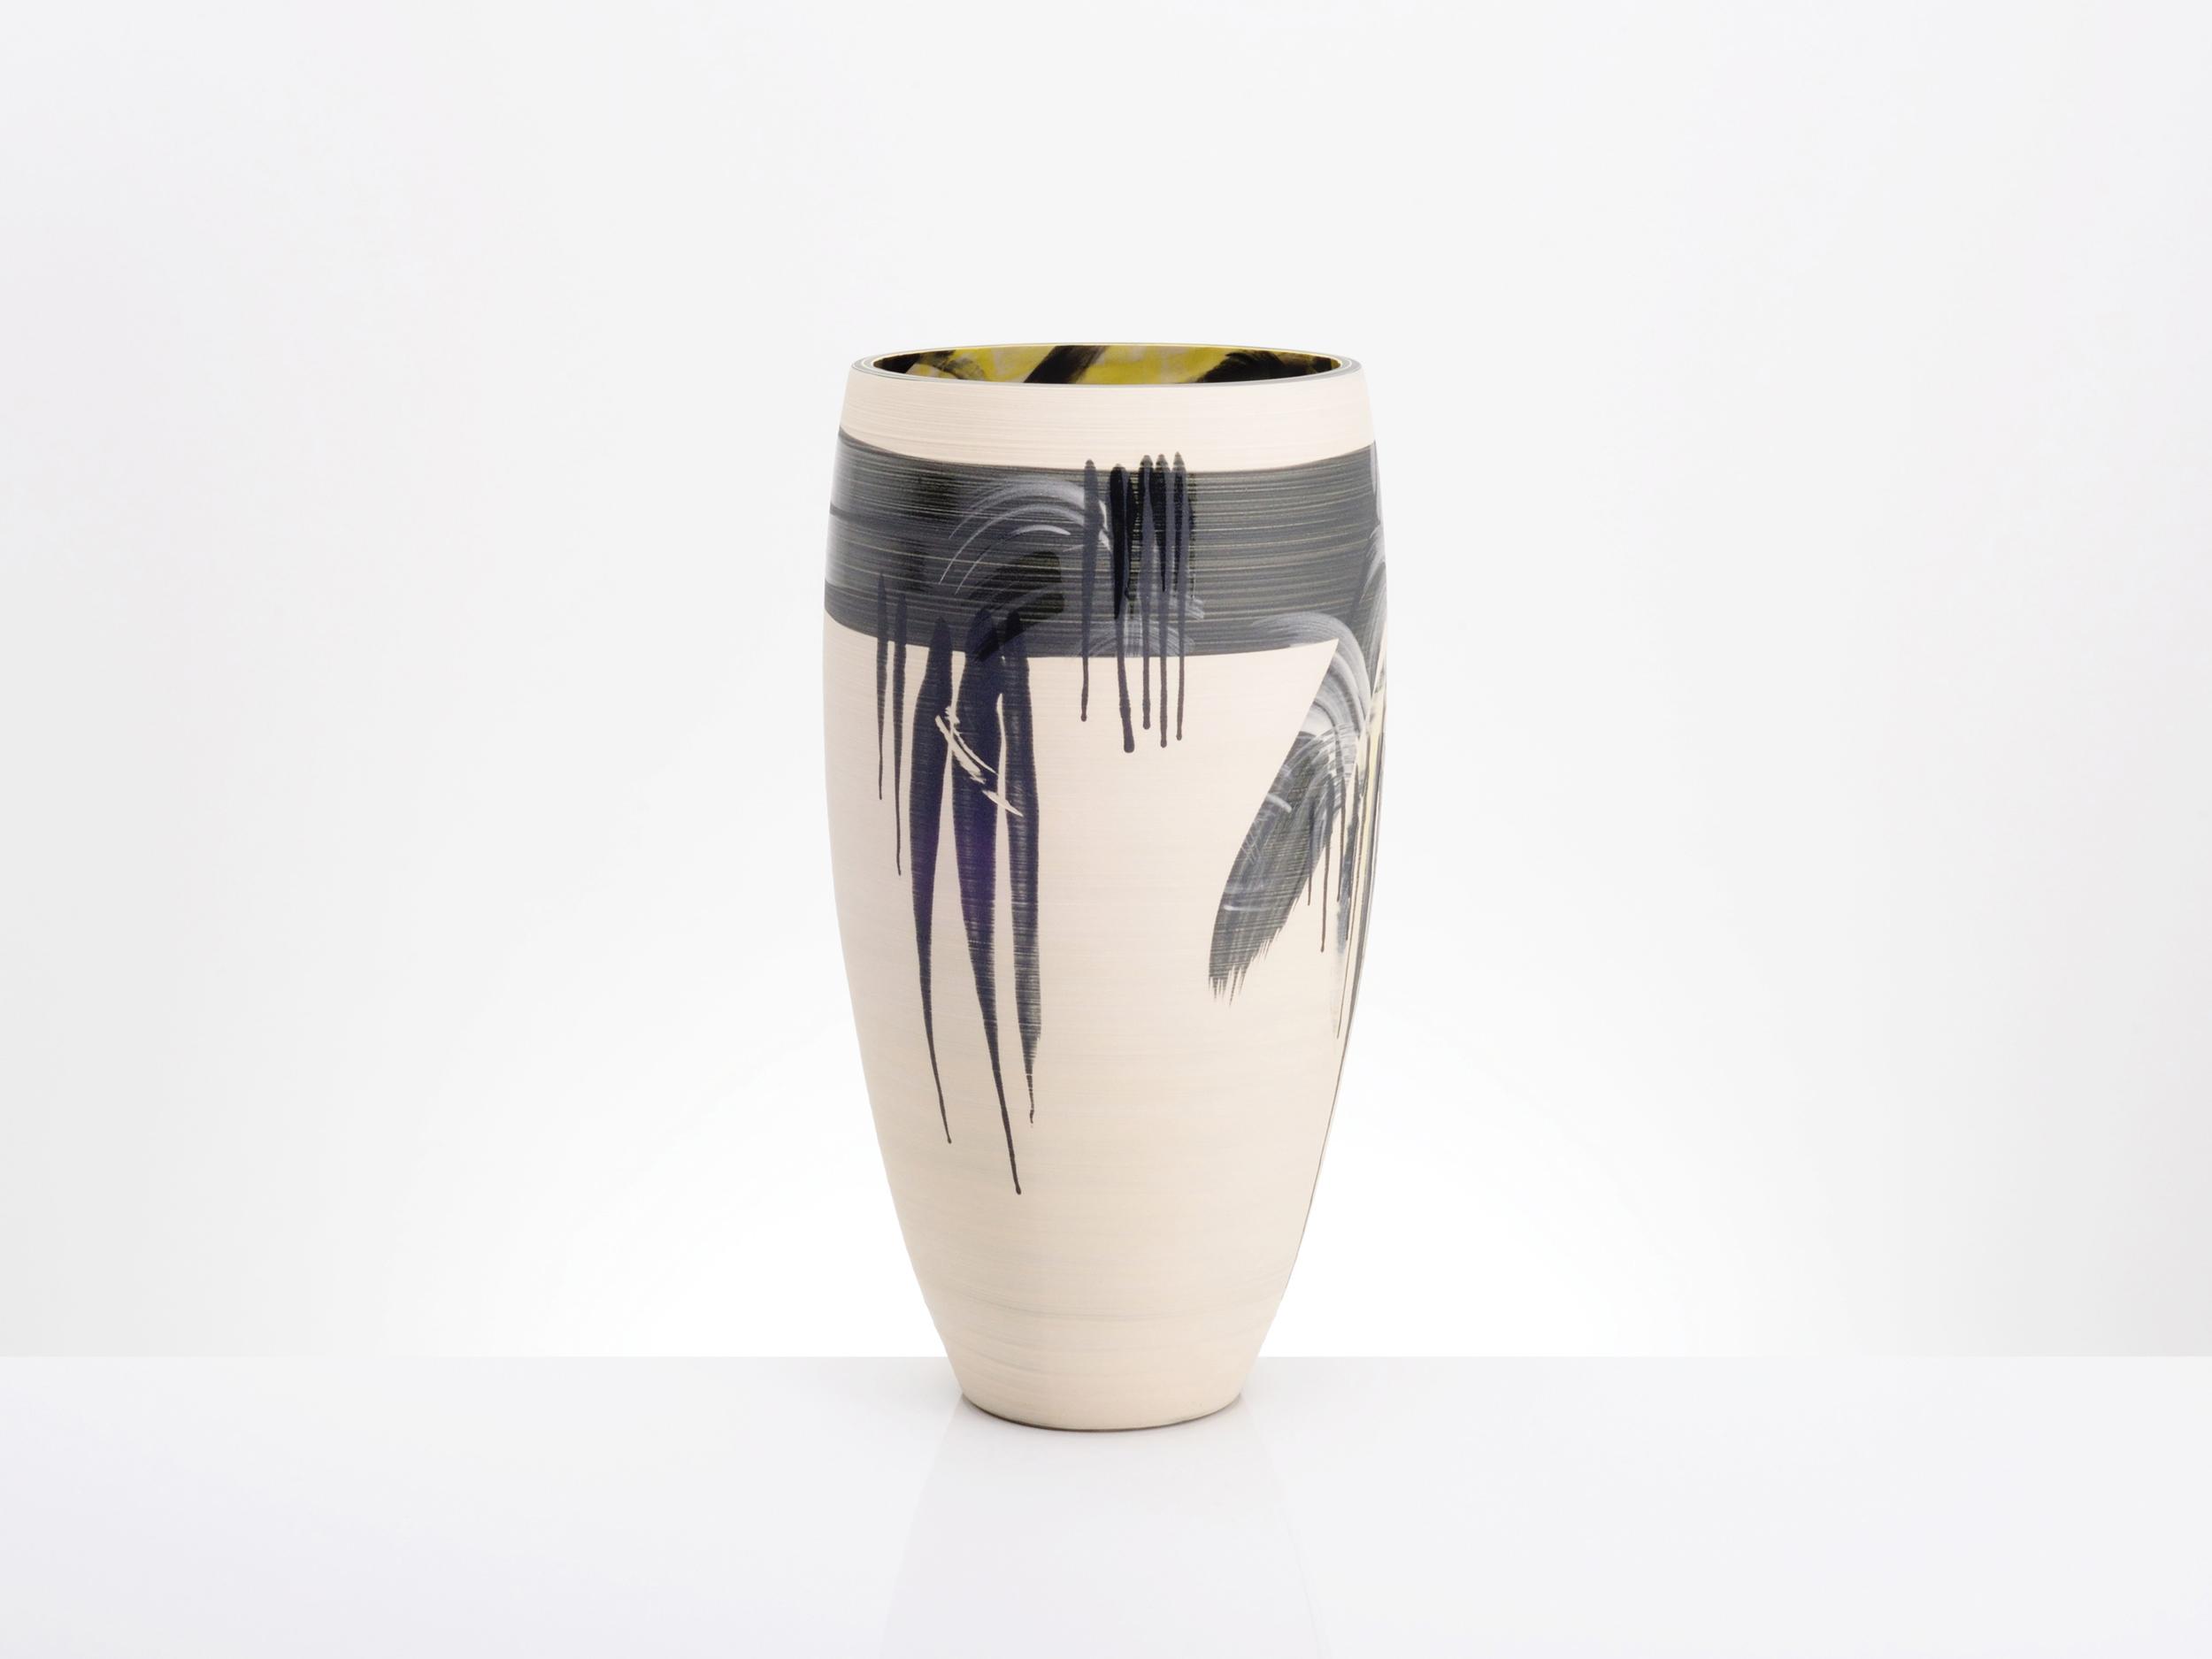 Feng Shui White Black Vase by Rowena Gilbert